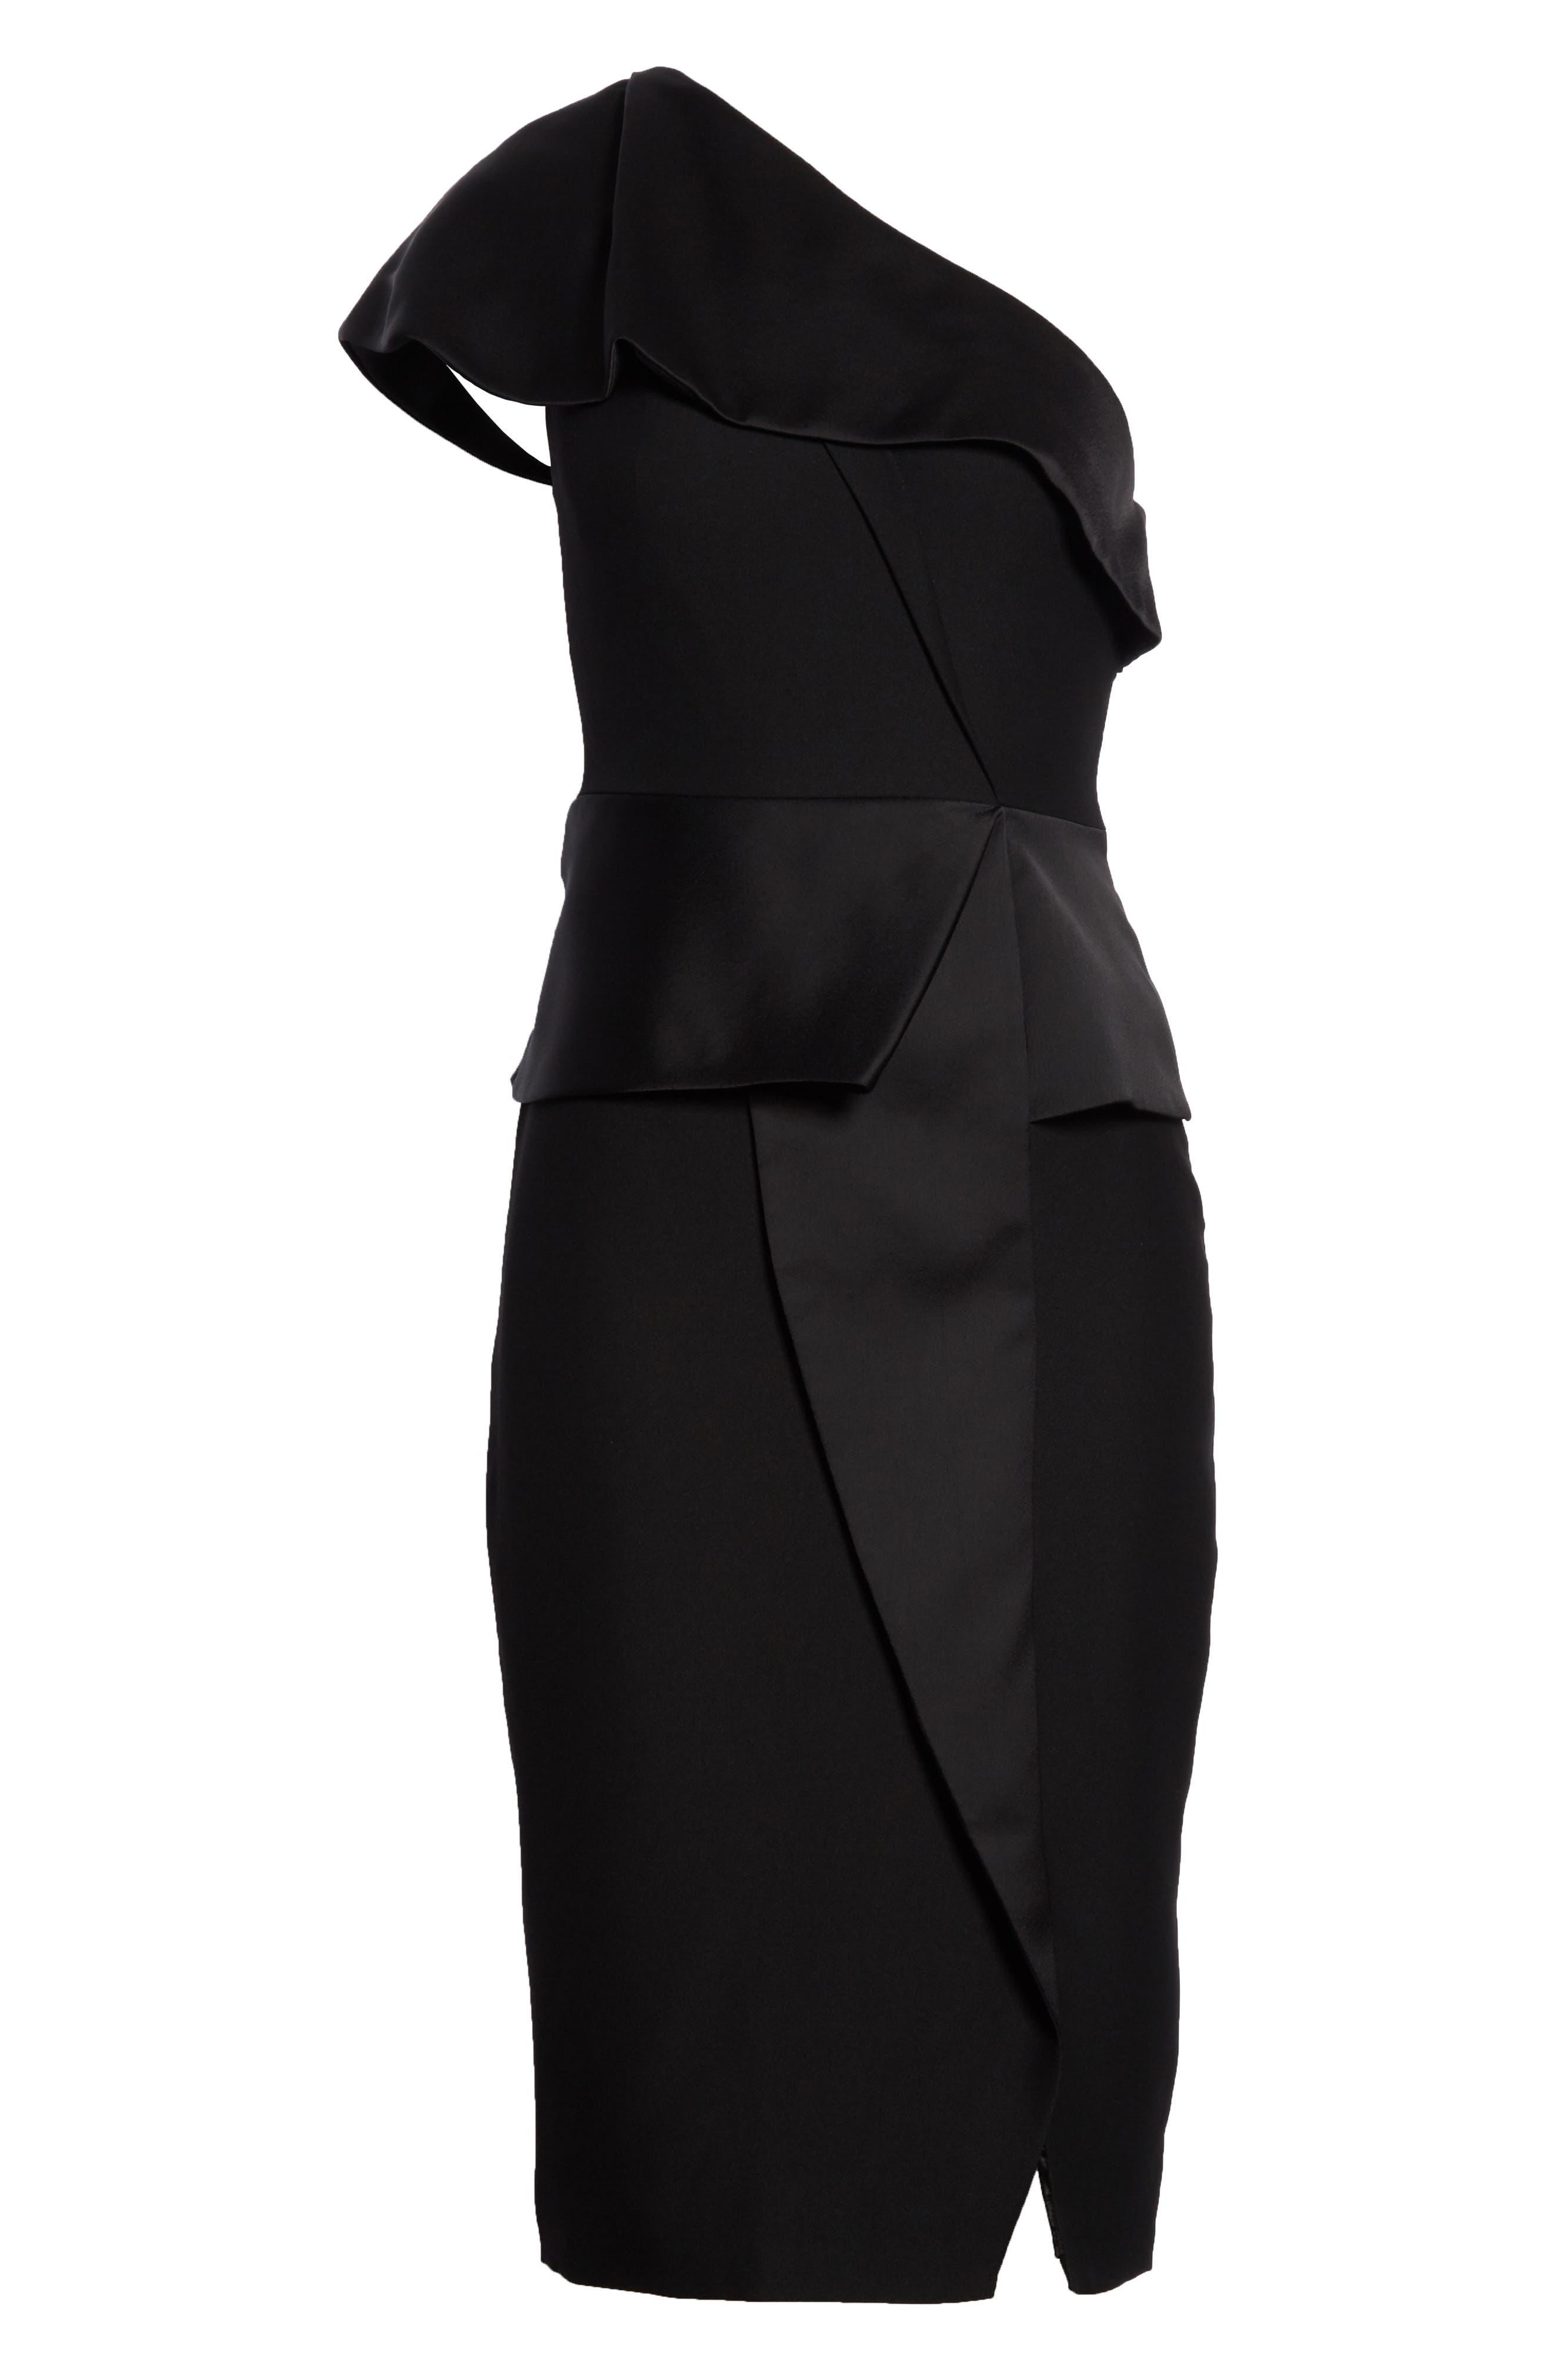 Pana One-Shoulder Peplum Sheath Dress,                             Alternate thumbnail 6, color,                             001